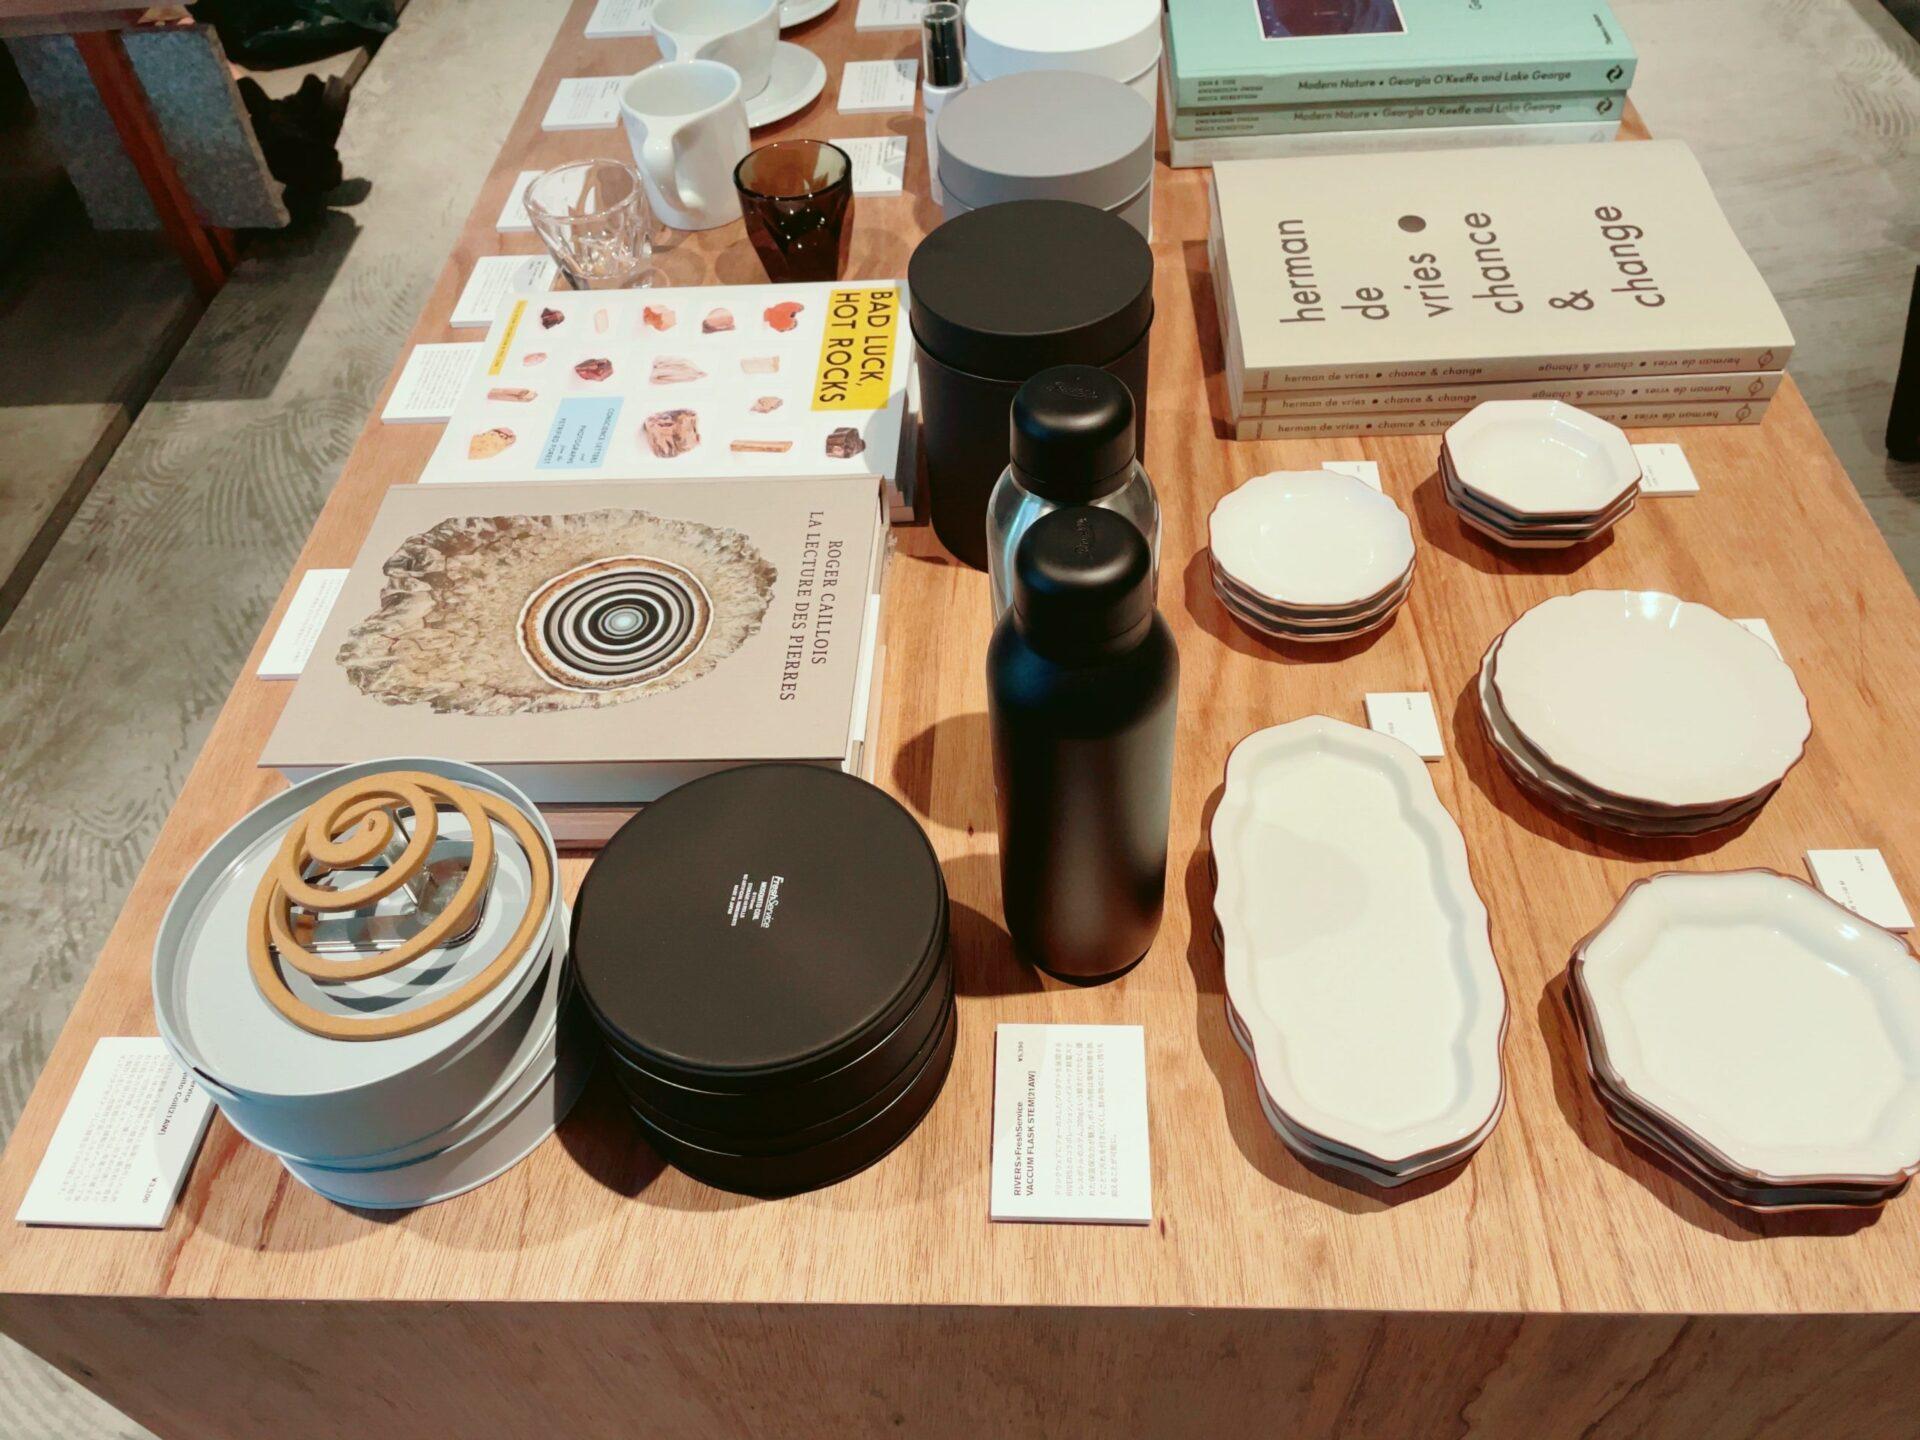 OGAWA COFFEE LABORATORY 下北沢店の物販